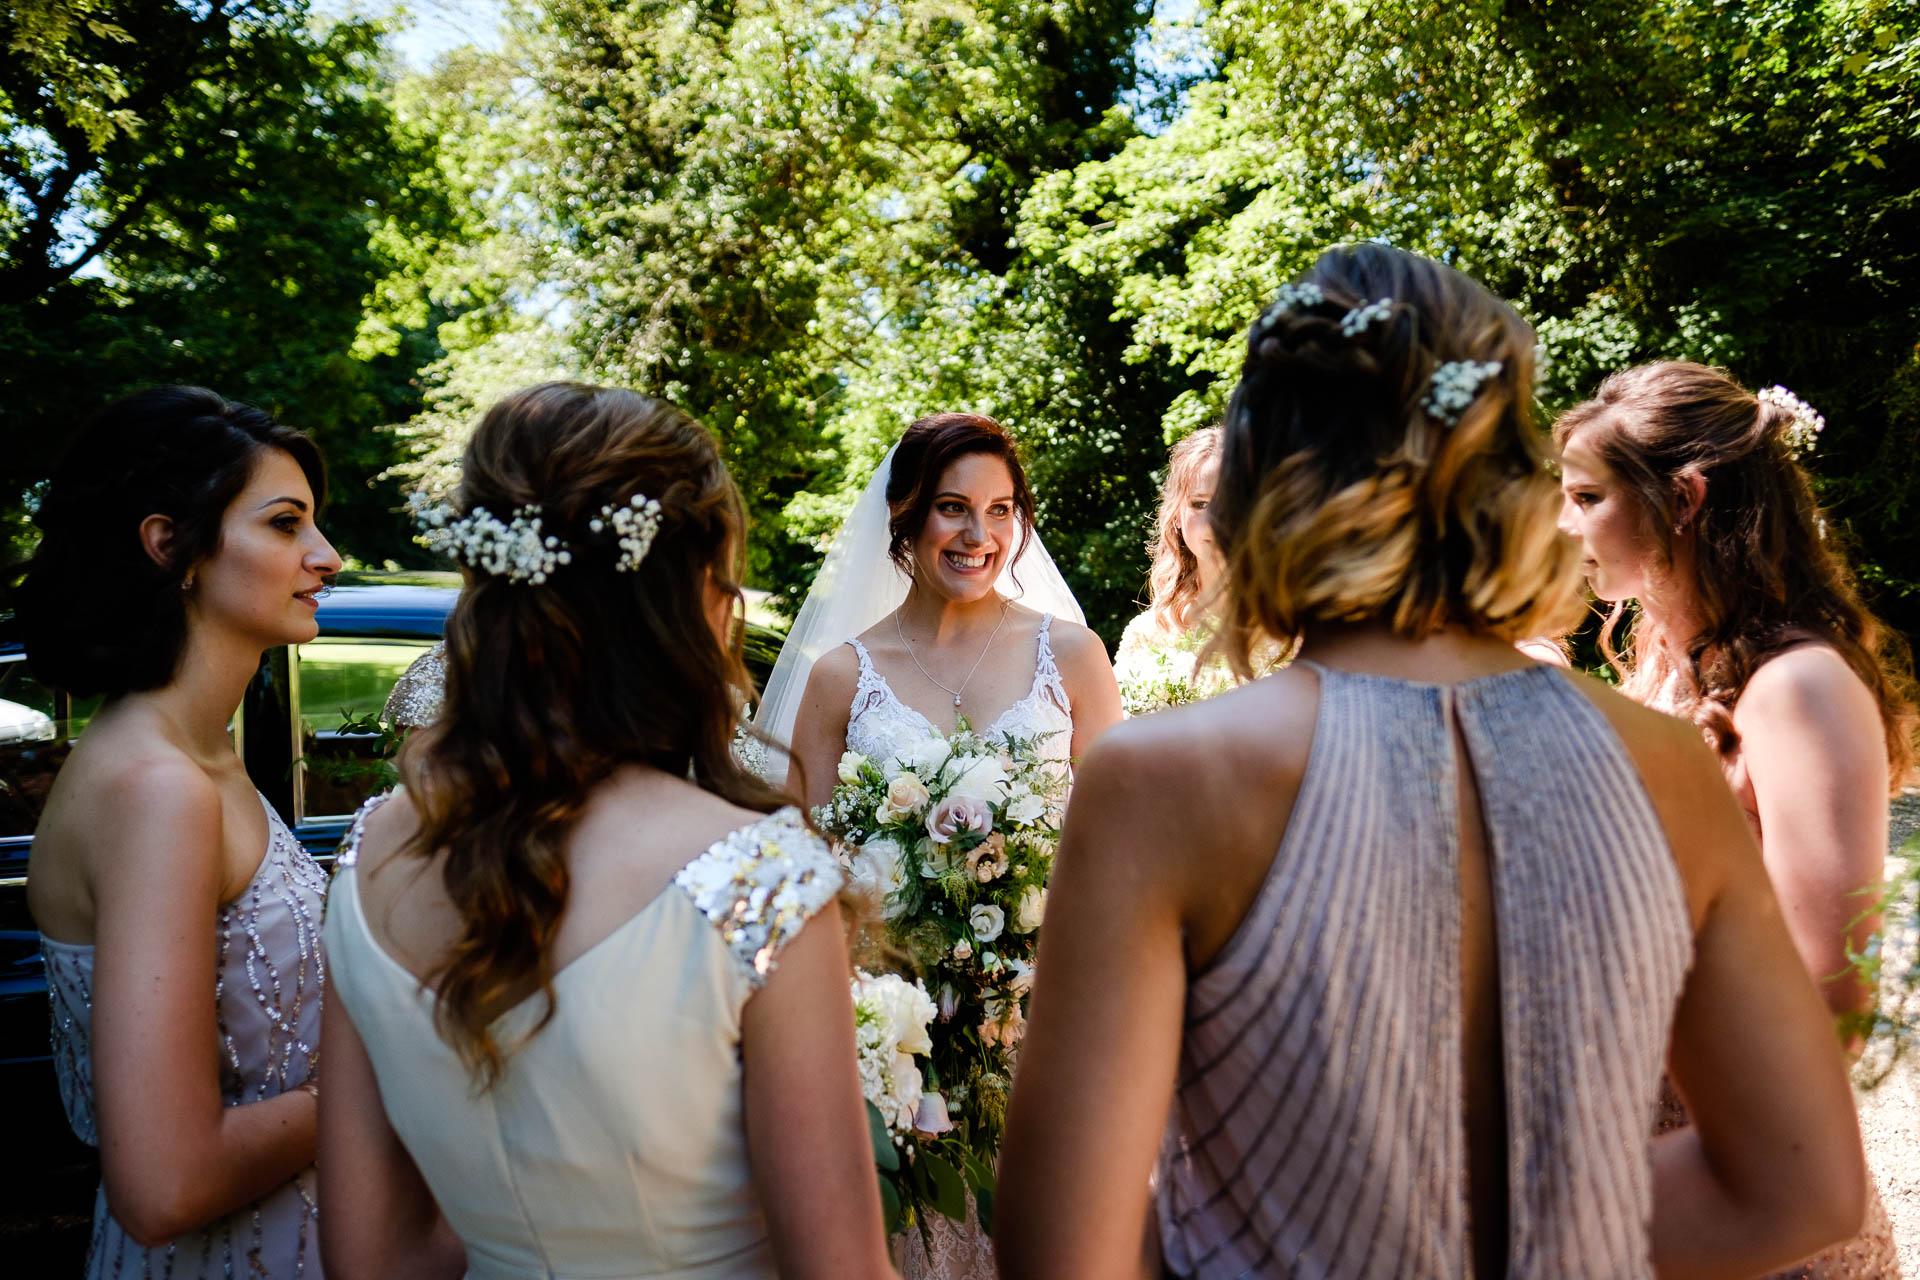 orchardleigh house wedding - Danni & Barney (108).jpg